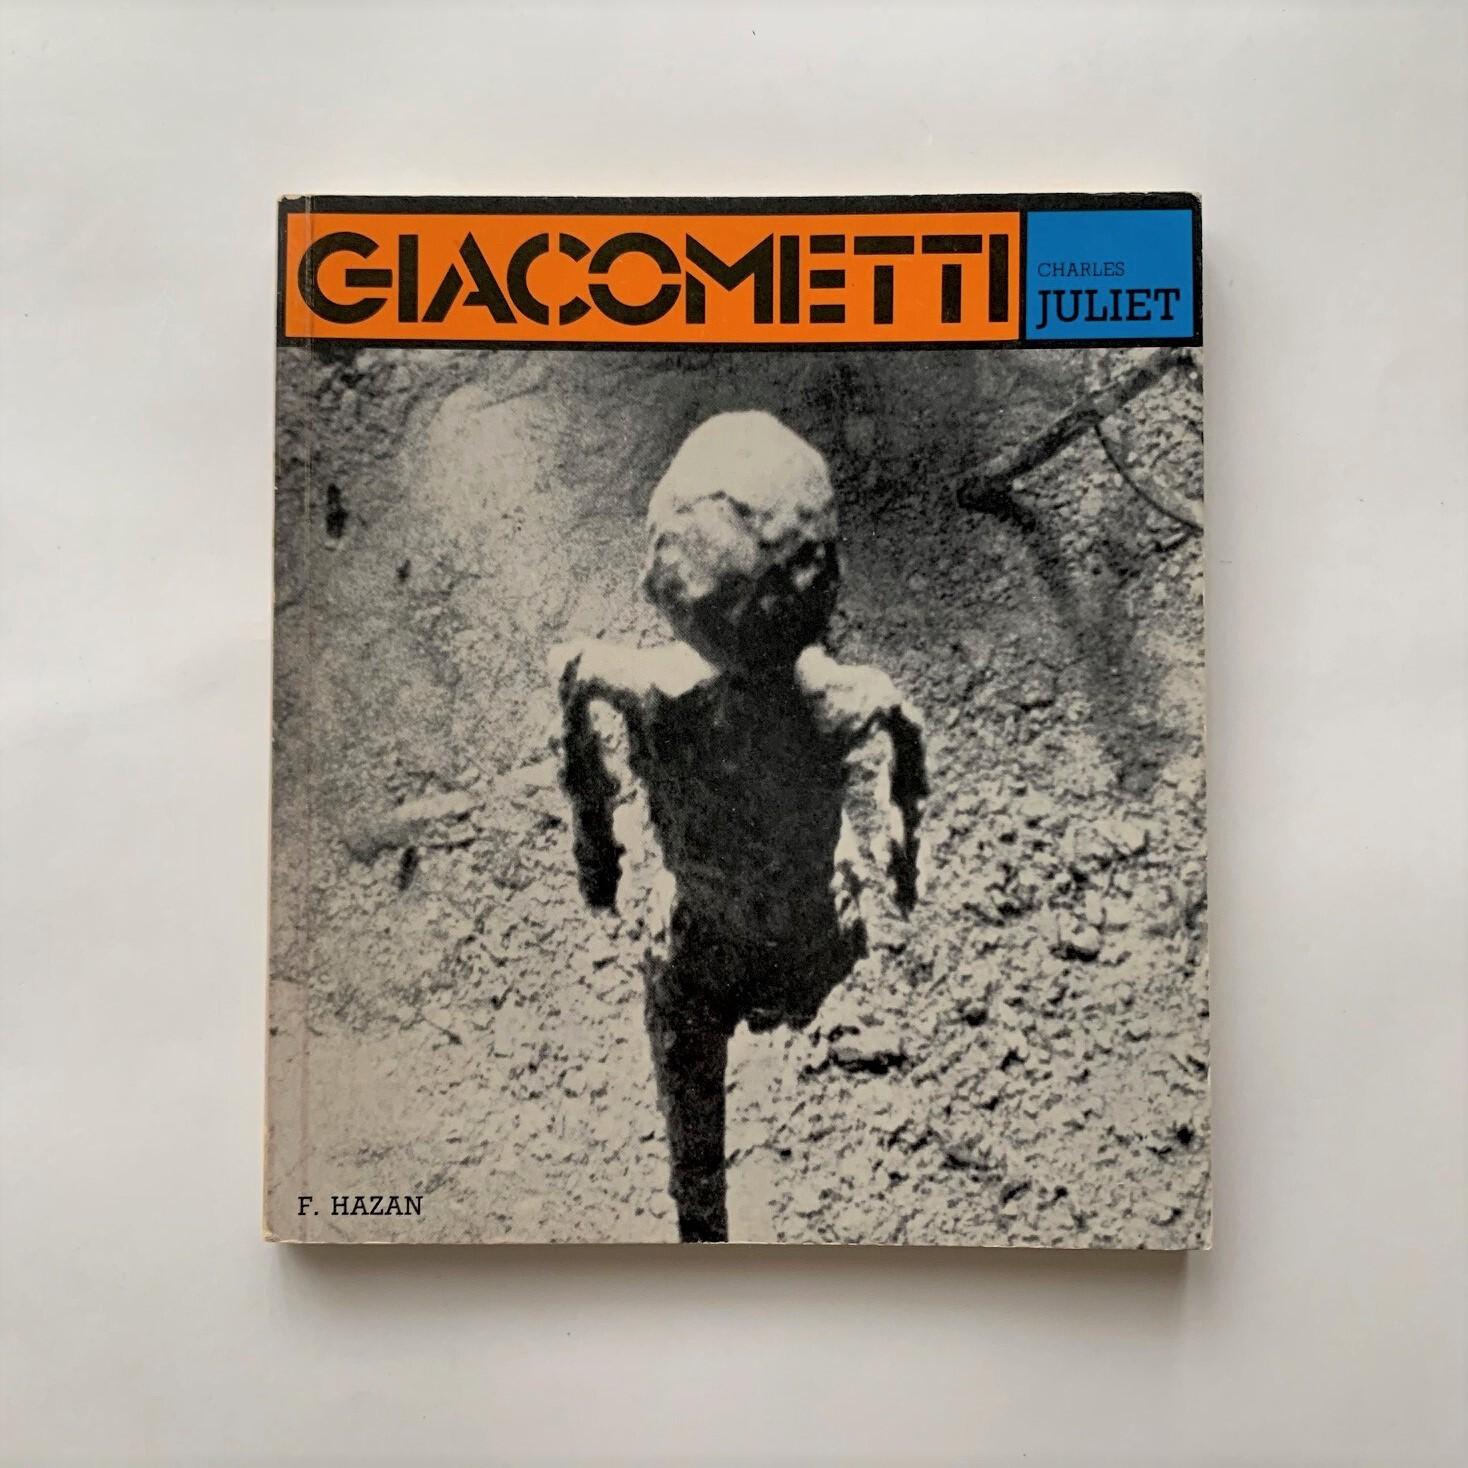 Giacometti   ジャコメッティ  /  Masters of modern art